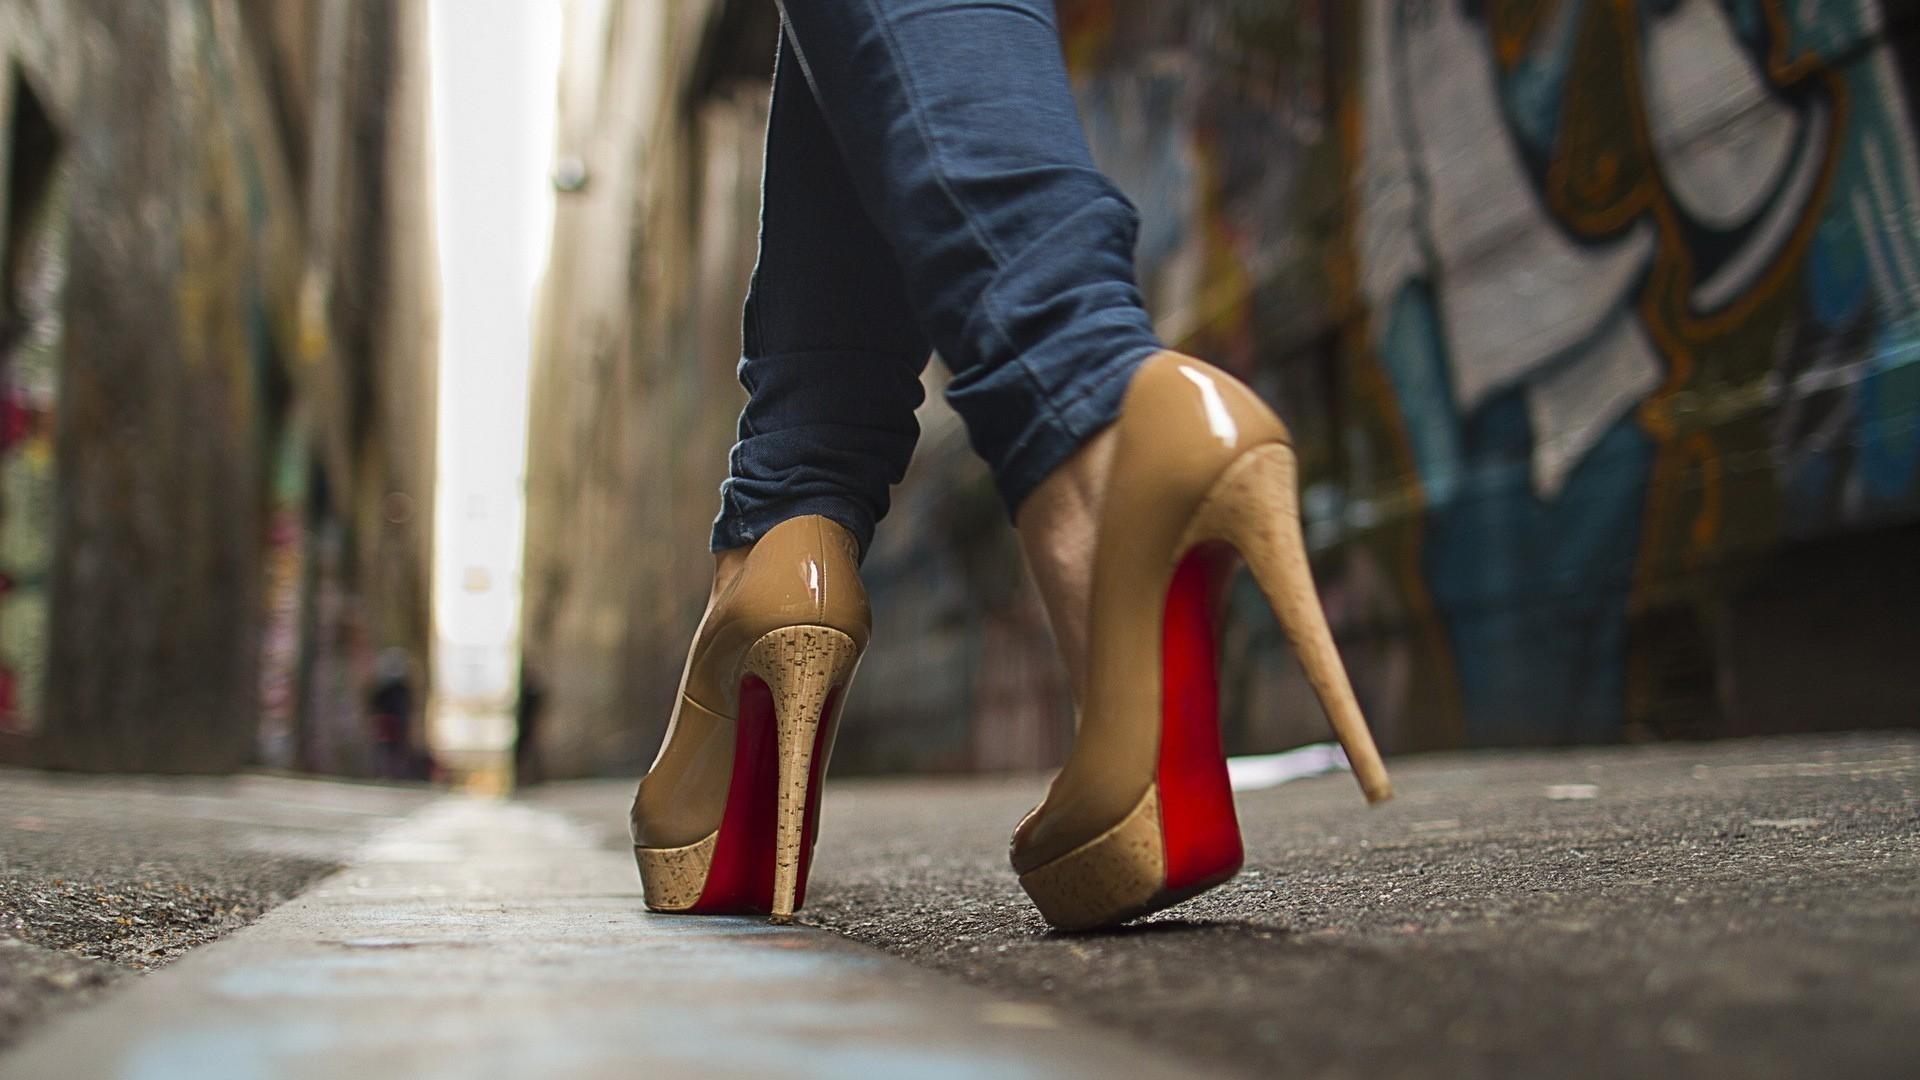 Shoes hd wallpaper download